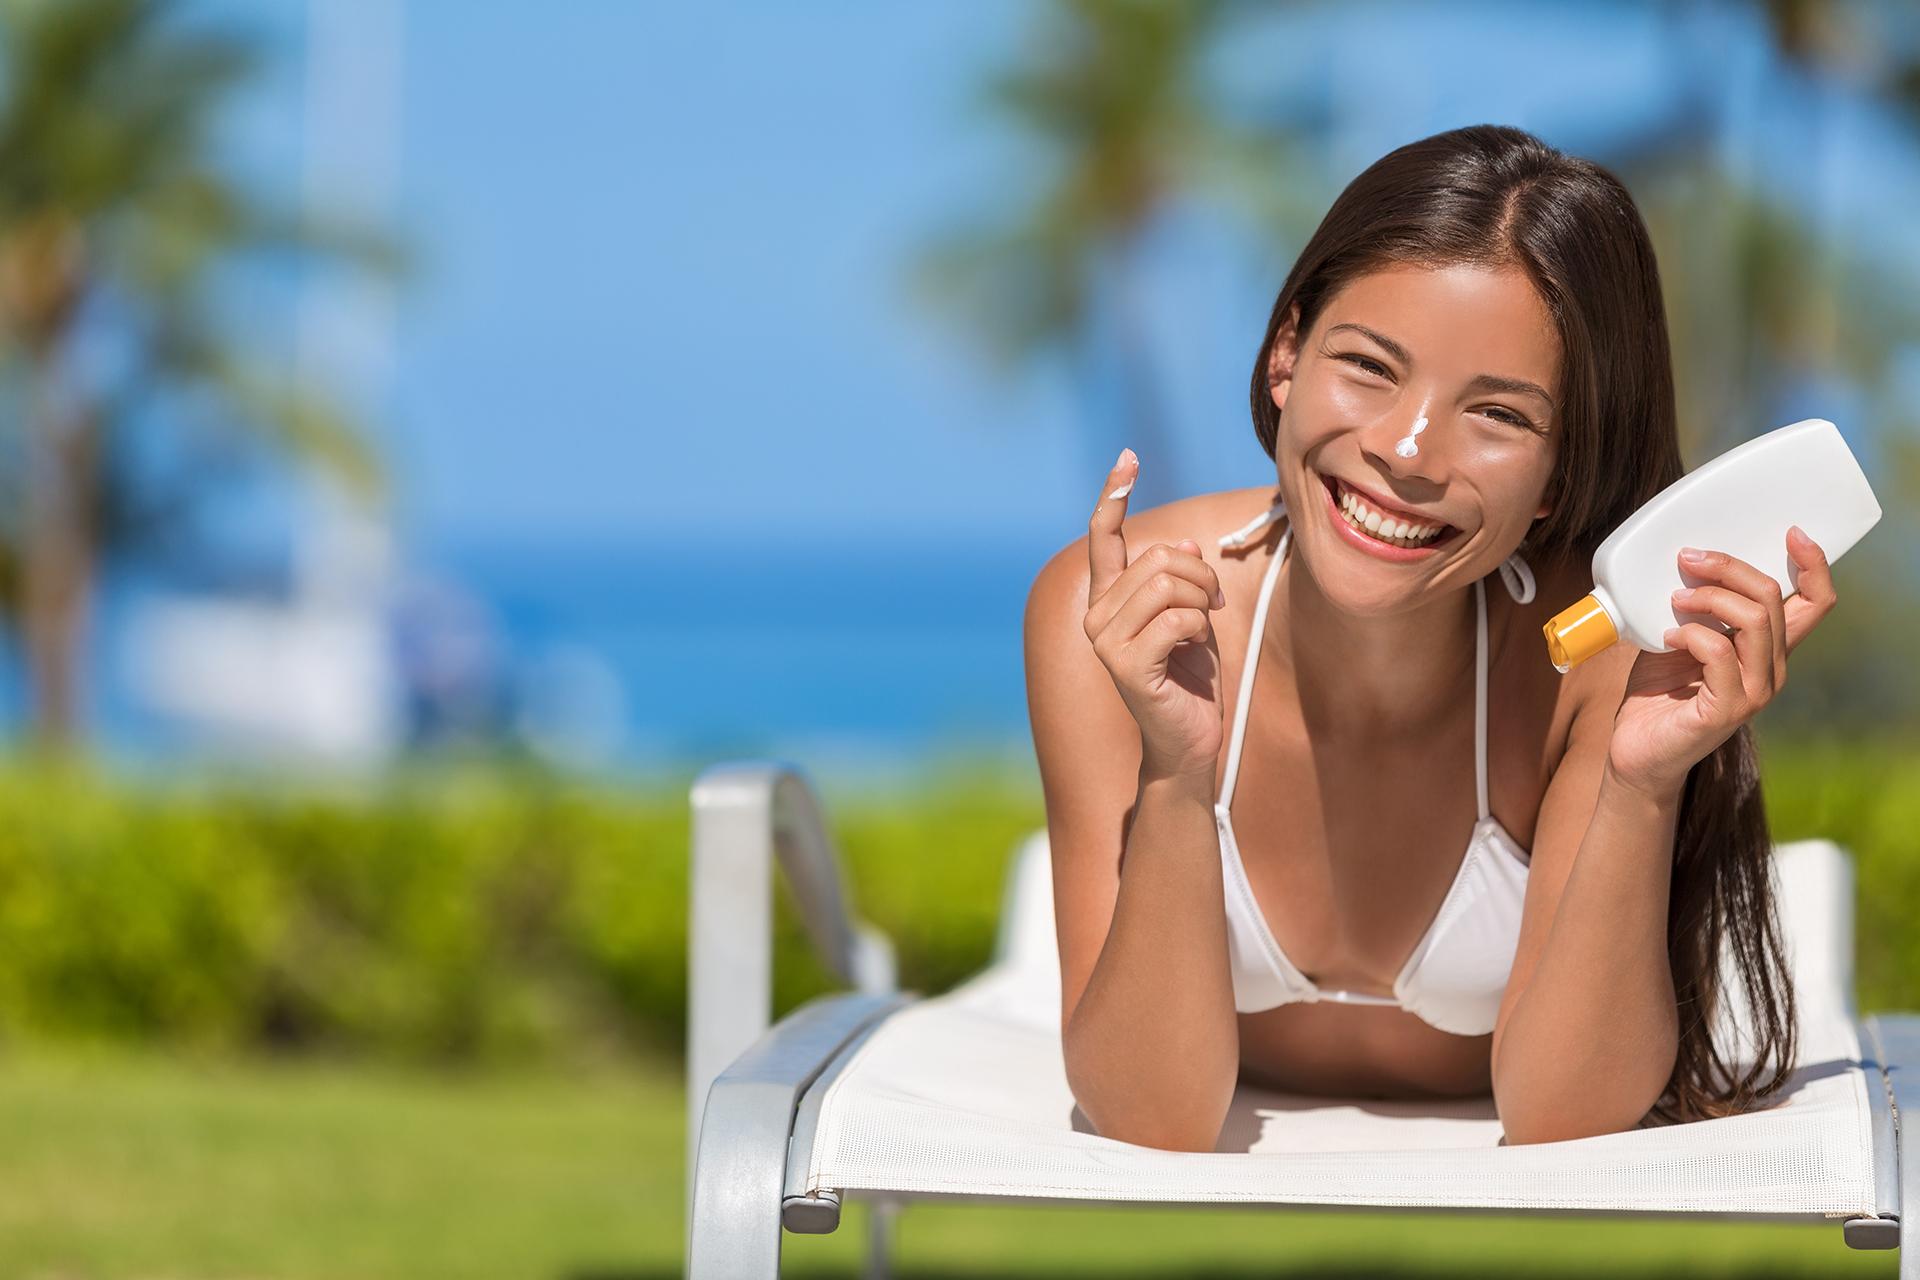 Sommer-Glück-Sonne-Sonnencreme-Frau-Carl-Roth-Lachen-Stand-Meer-Krebs-Haut-Hautkrebs